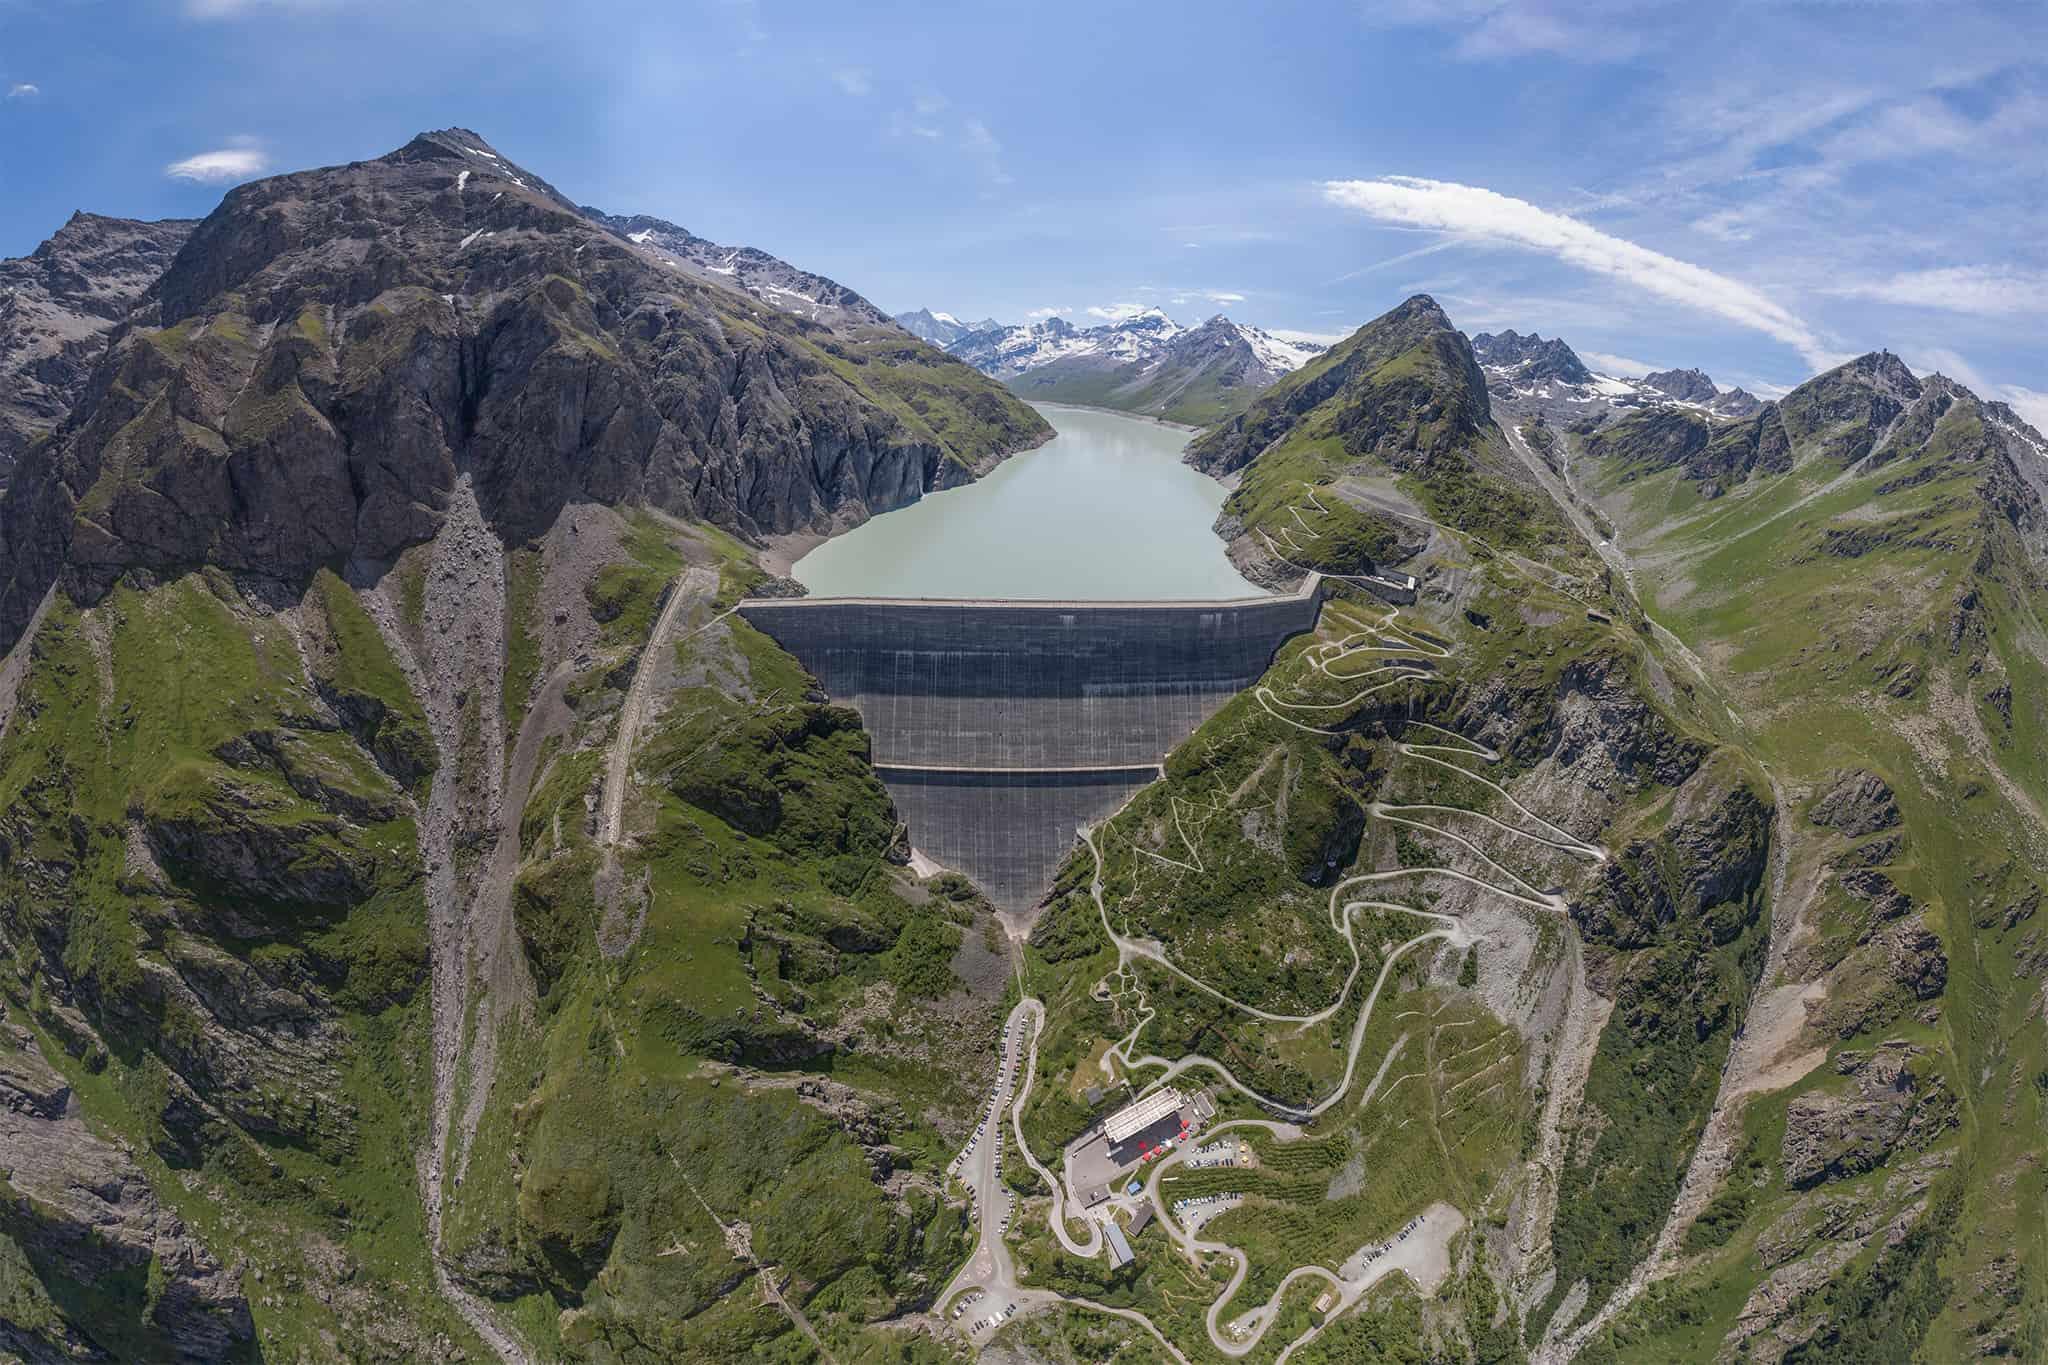 https://www.dixence-resort.ch/wp-content/uploads/2019/09/dixence-dam_stereografik.jpg